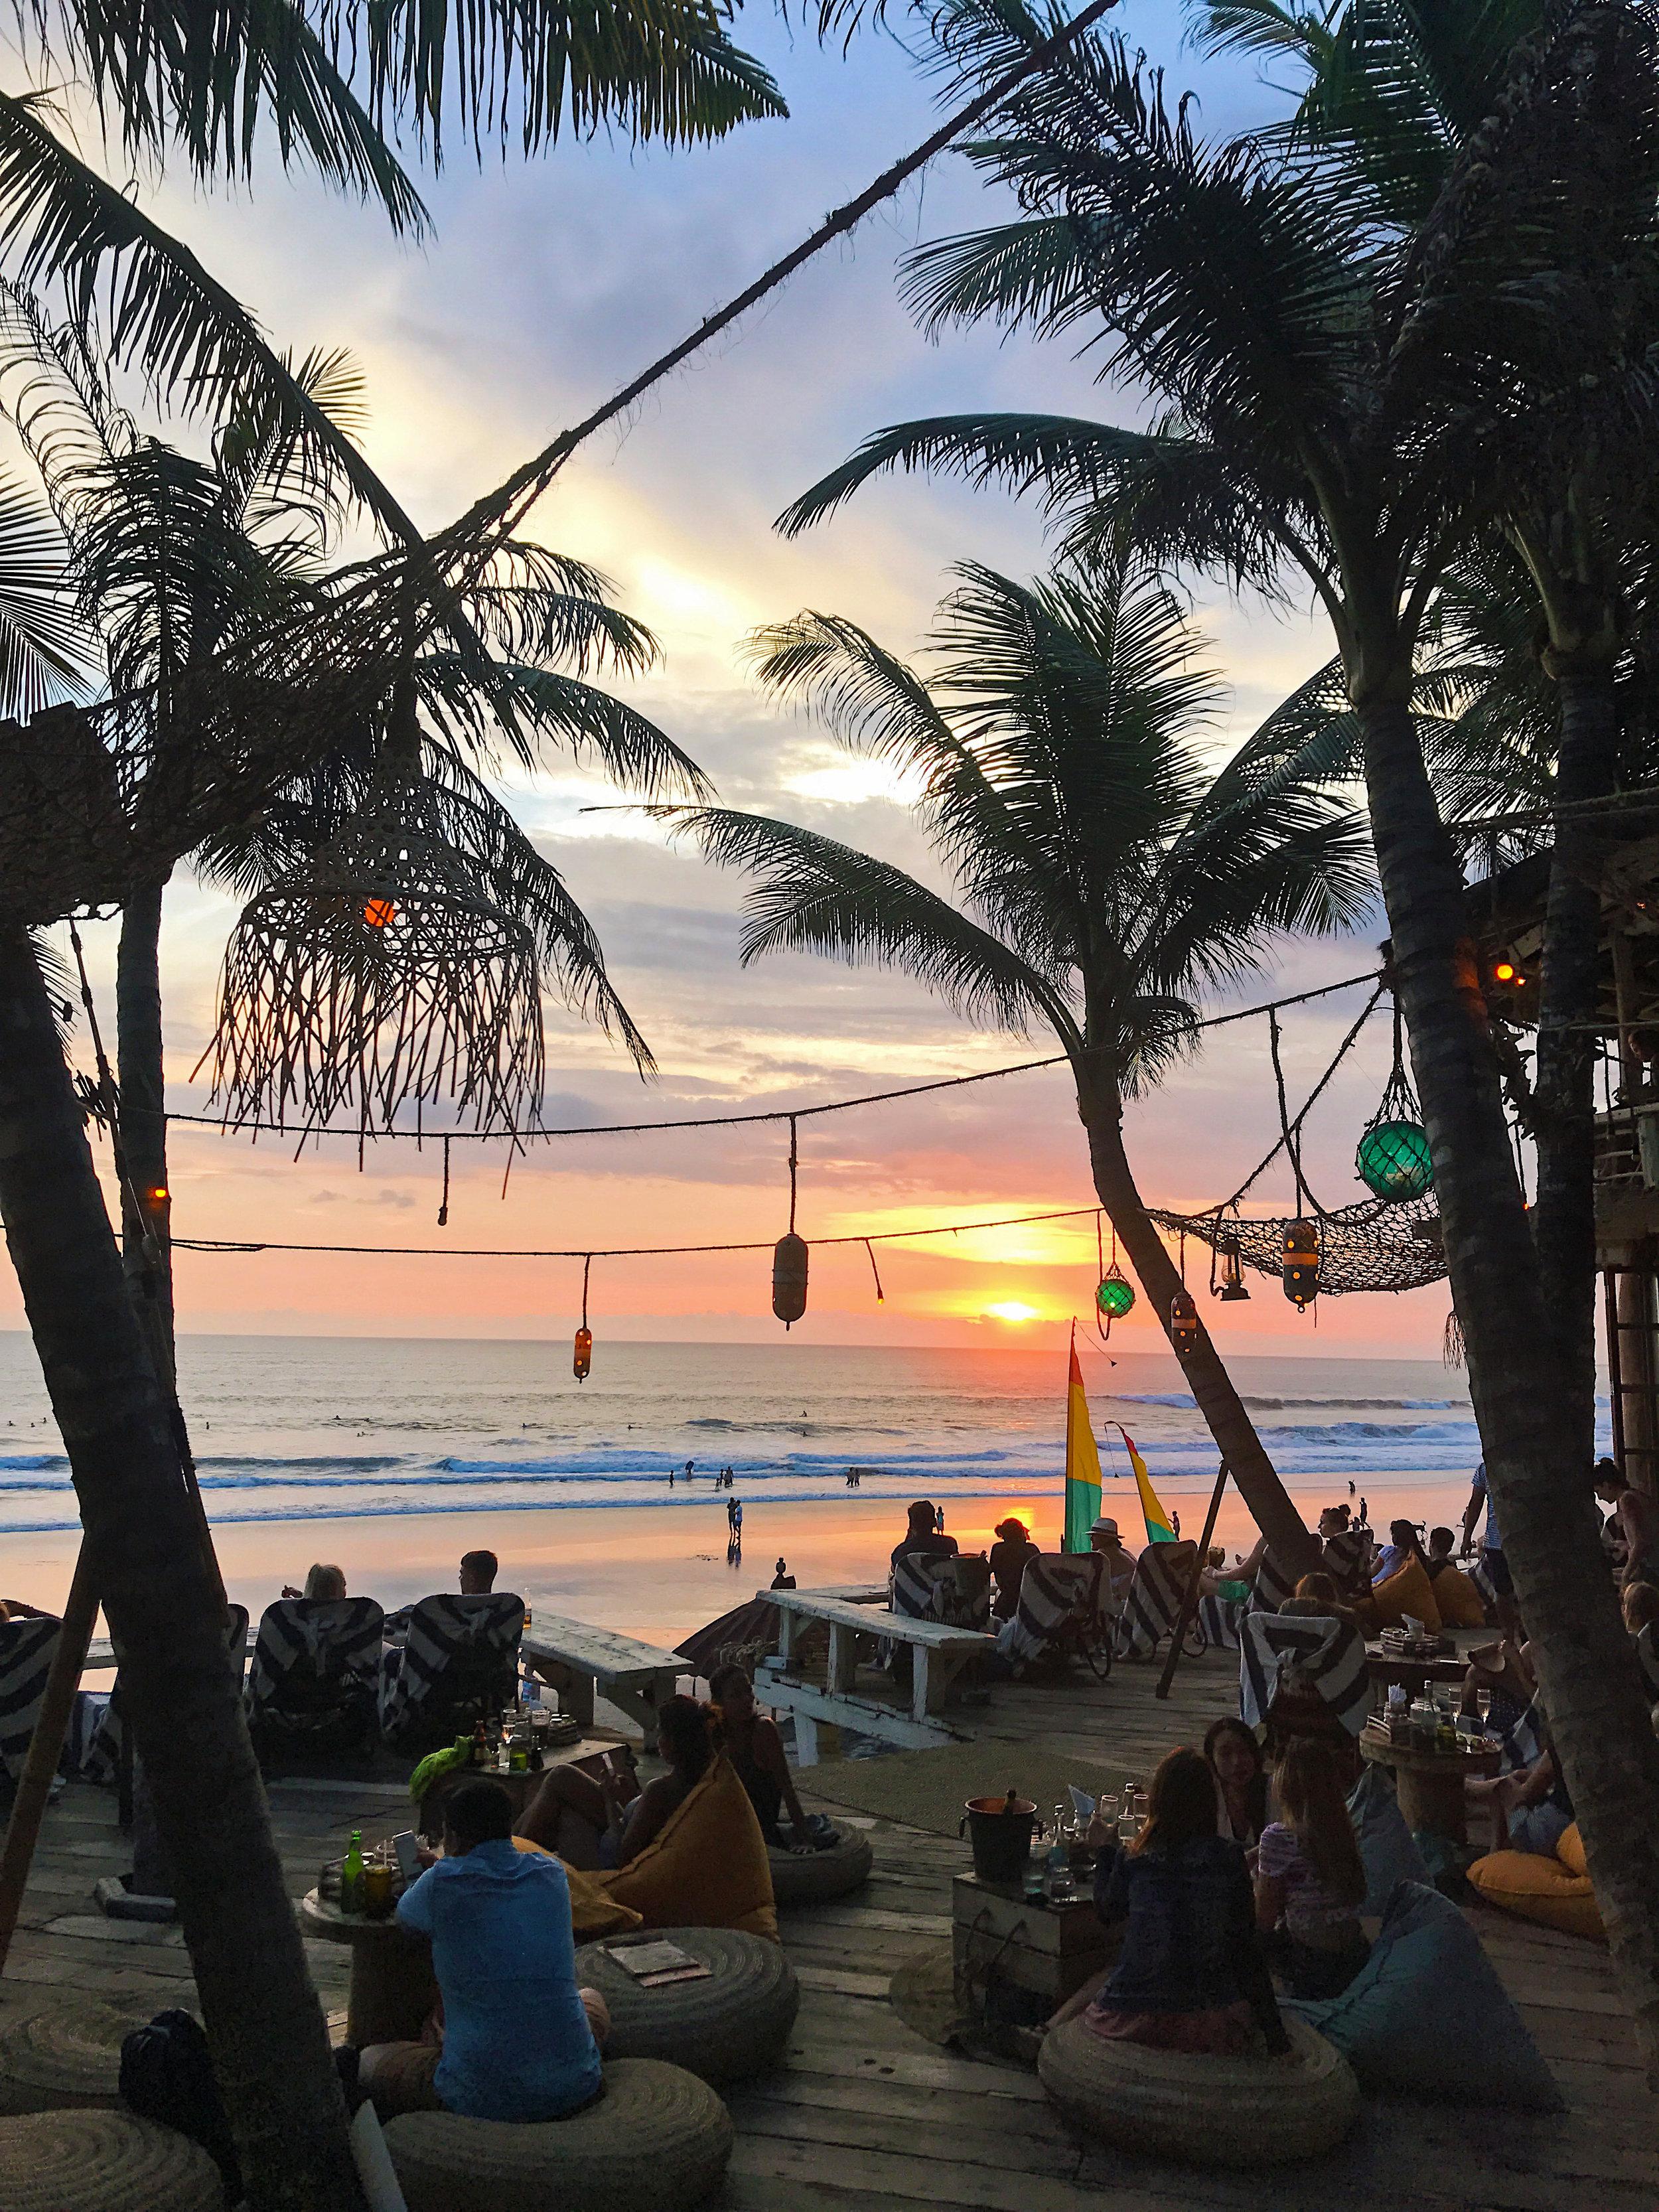 Sunset at La Brisa beach club, Canggu, Bali